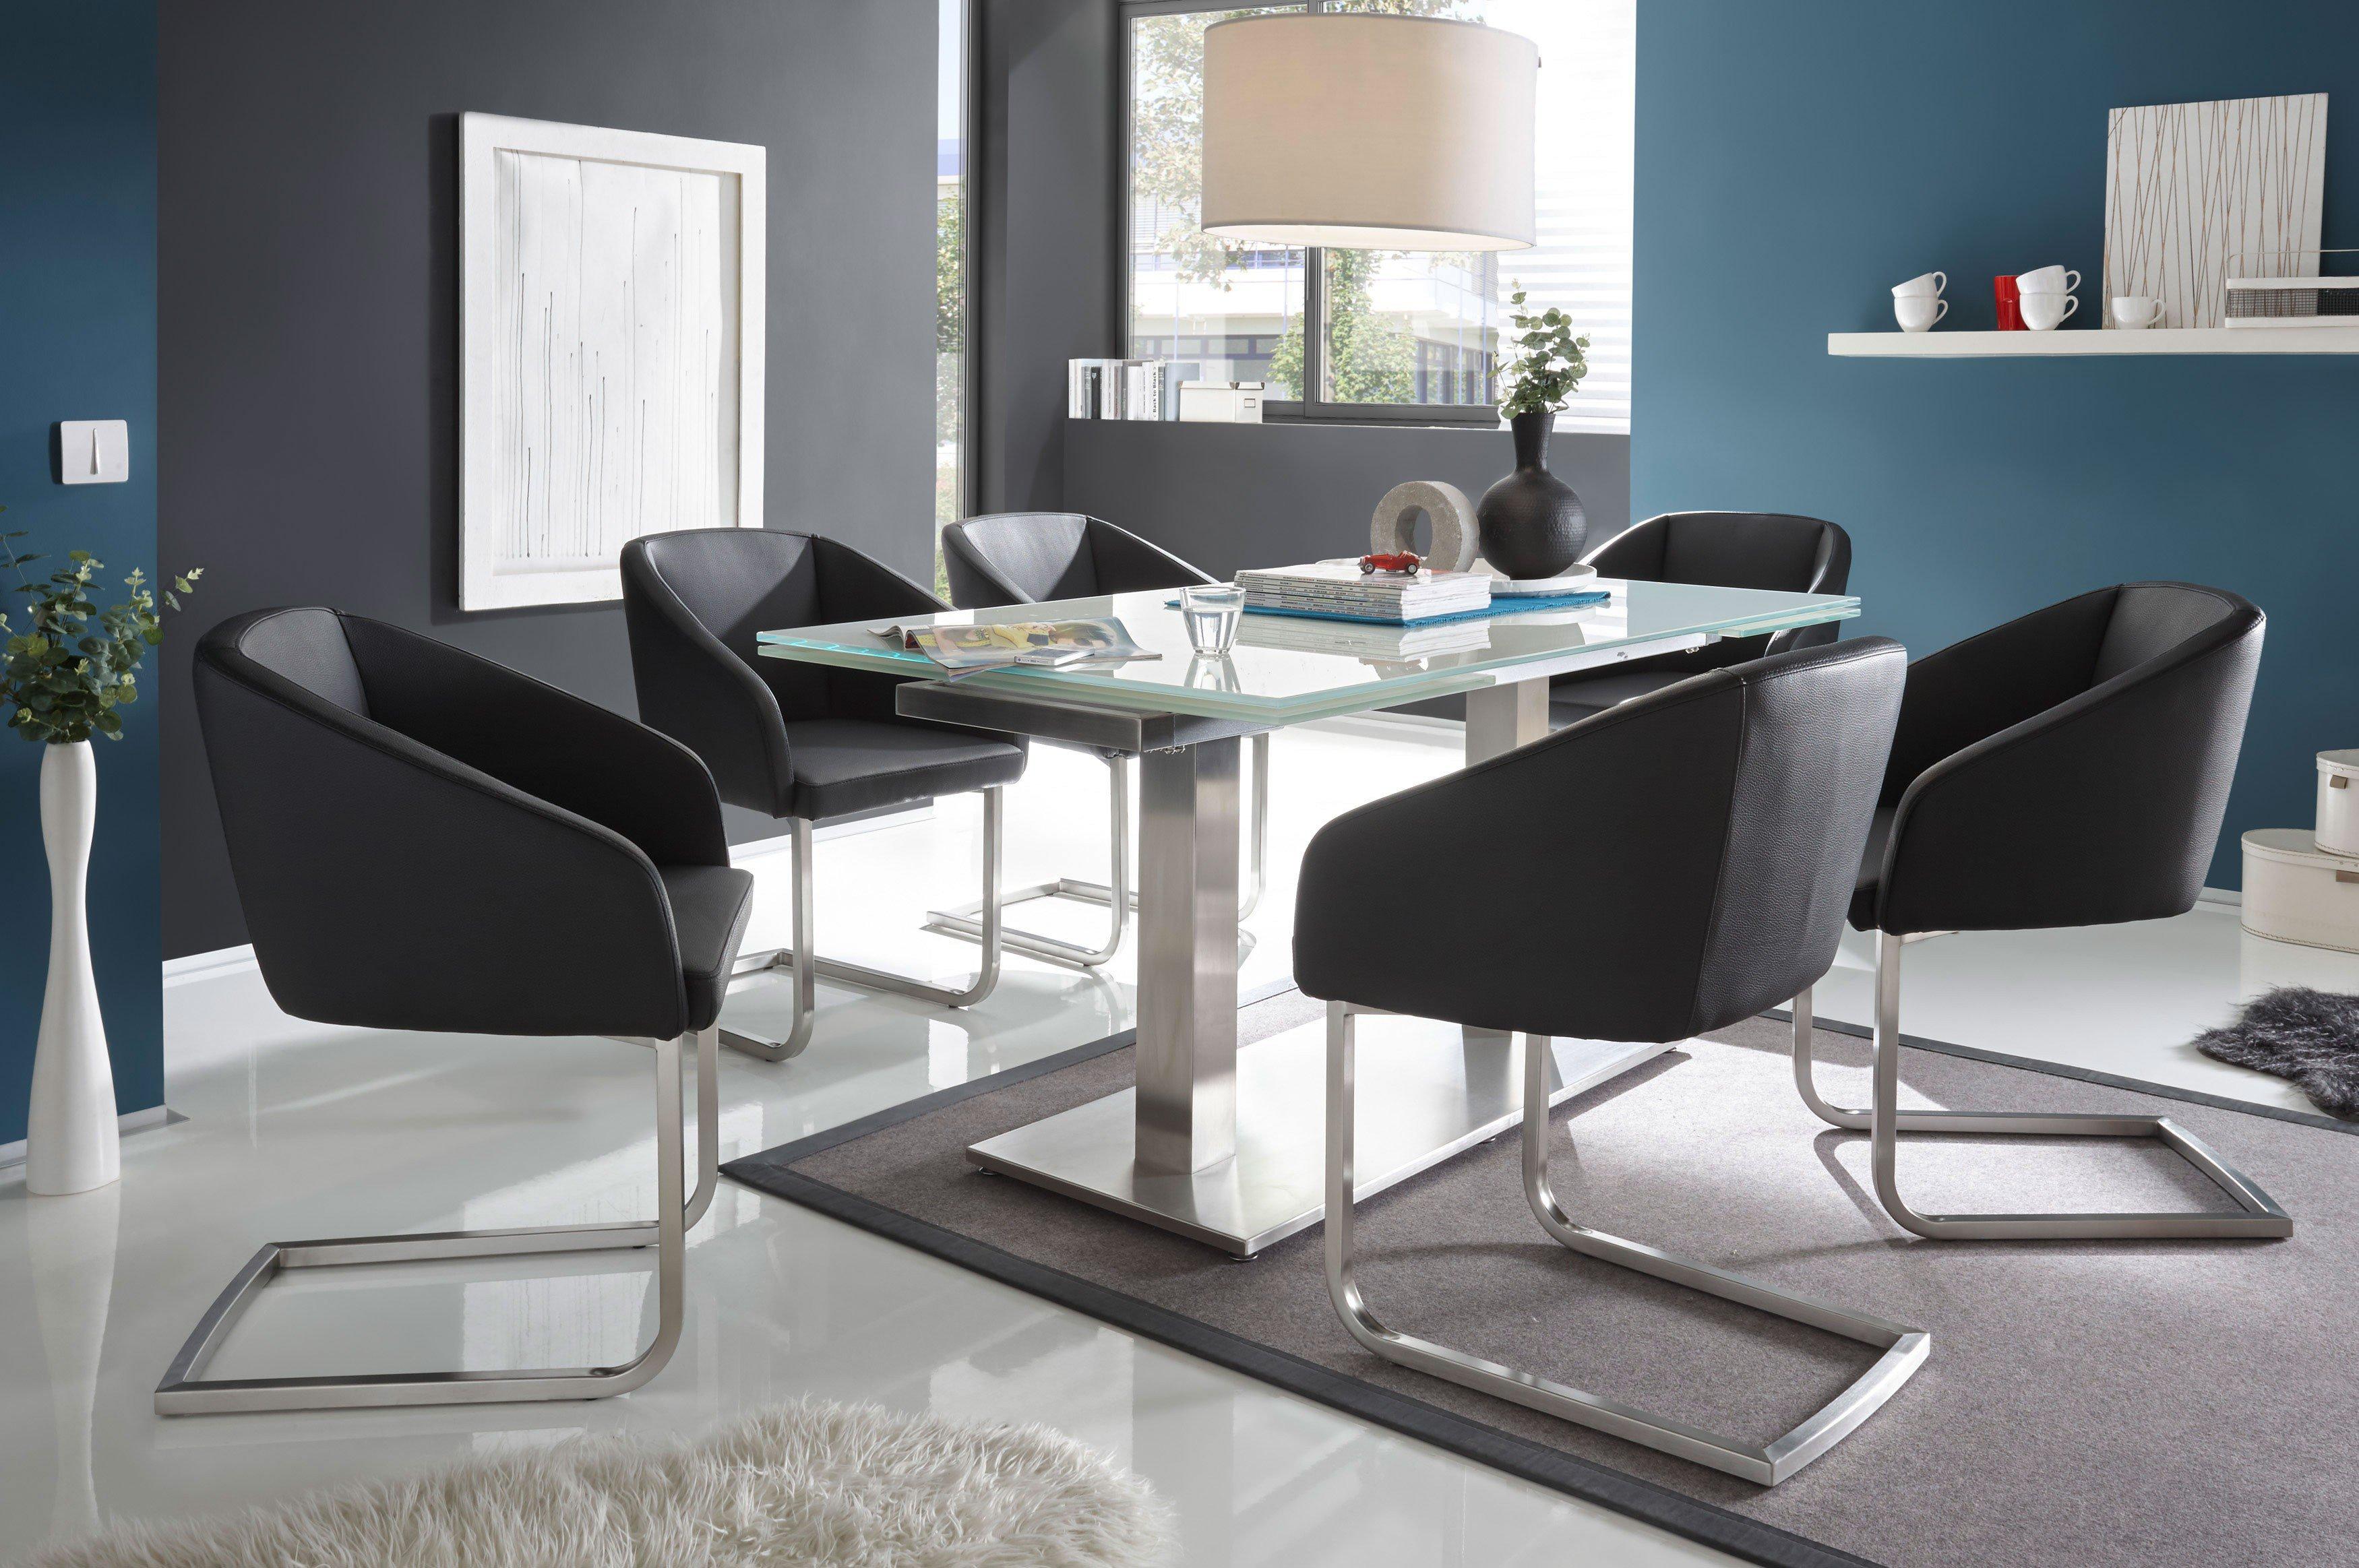 mwa aktuell esszimmer nova marquita london m bel letz. Black Bedroom Furniture Sets. Home Design Ideas